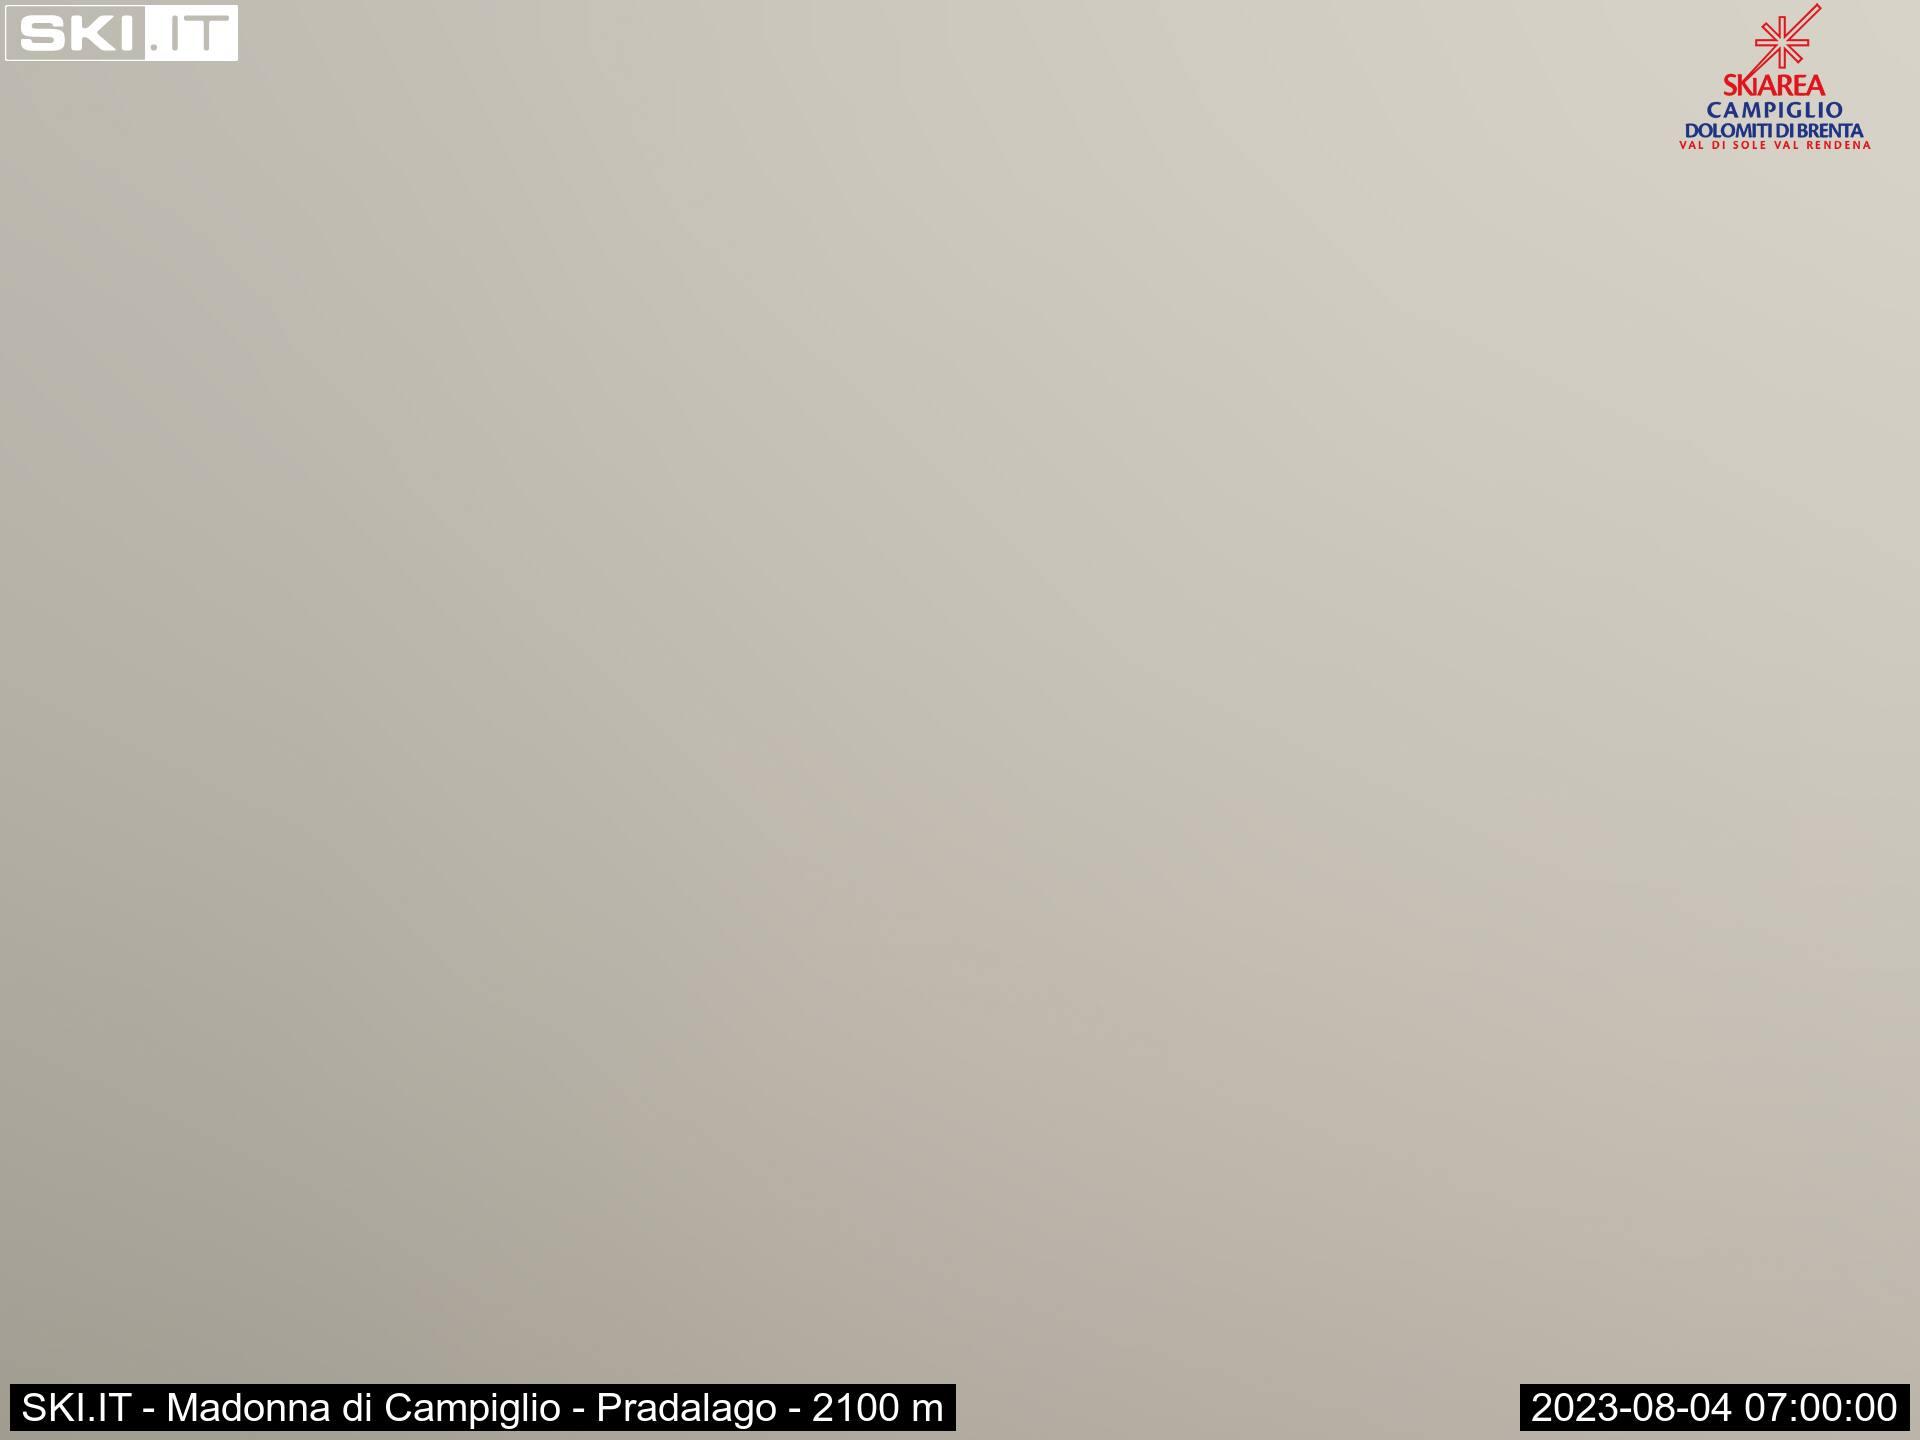 Webcam Madonna di Campiglio ski area Pradalago